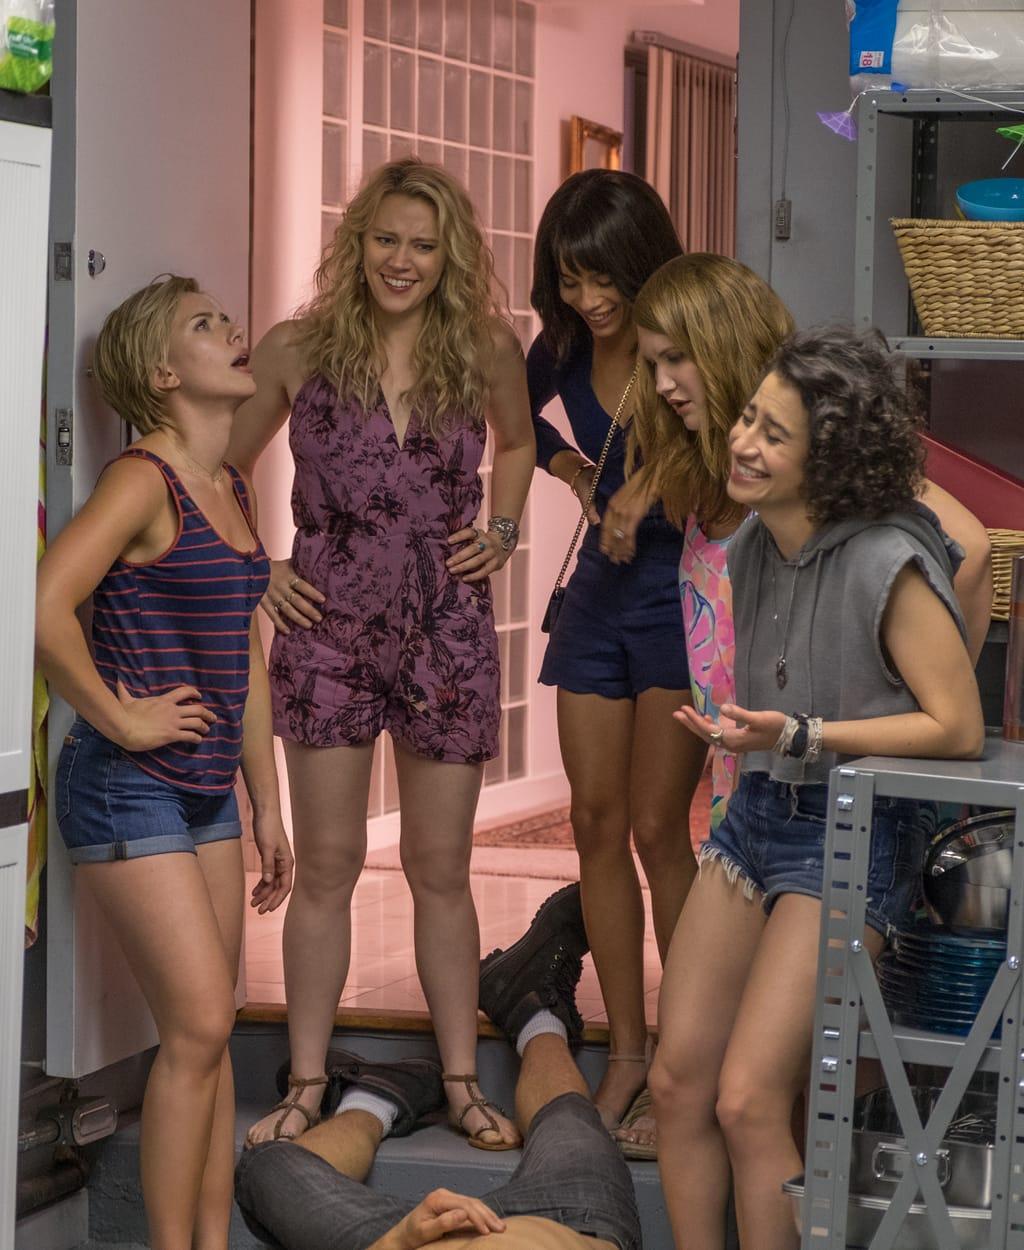 Rough Night Movie still -- Scarlett Johansson;Kate McKinnon; Zoe Kravitz ; Jillian Bell; and Ilana Glazer; in ROUGH NIGHT